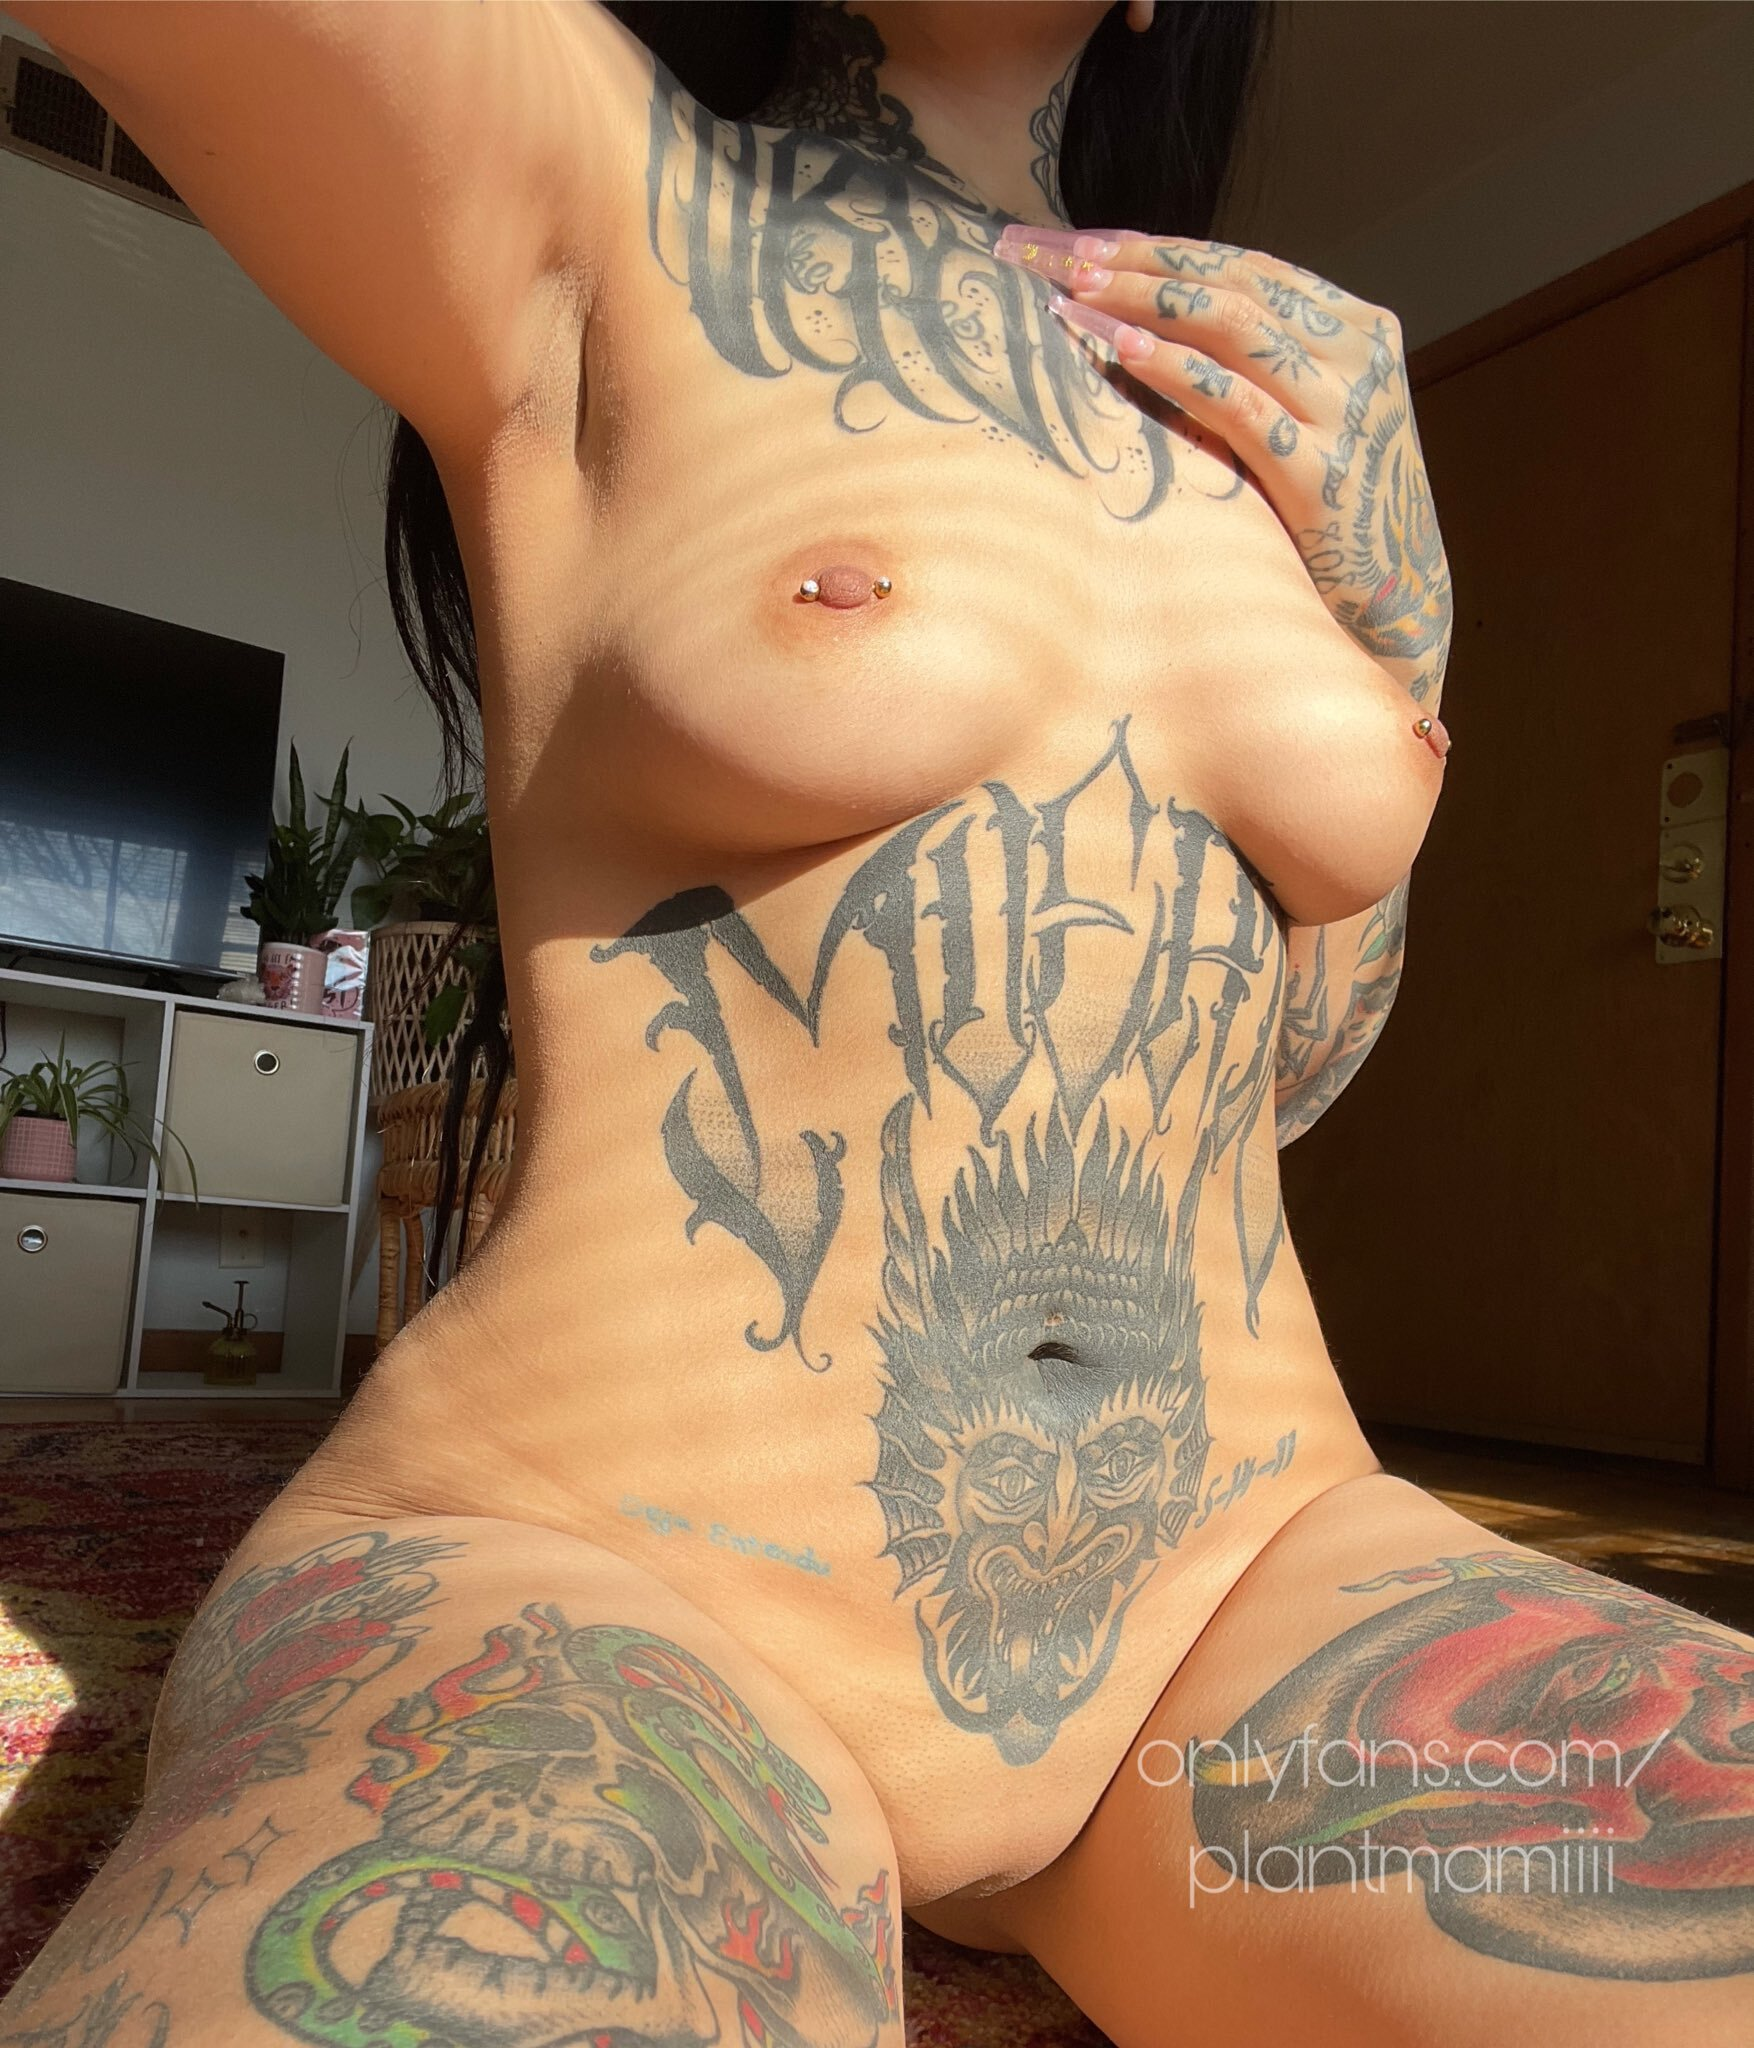 Os gustan las chicas sexy tatuadas ?